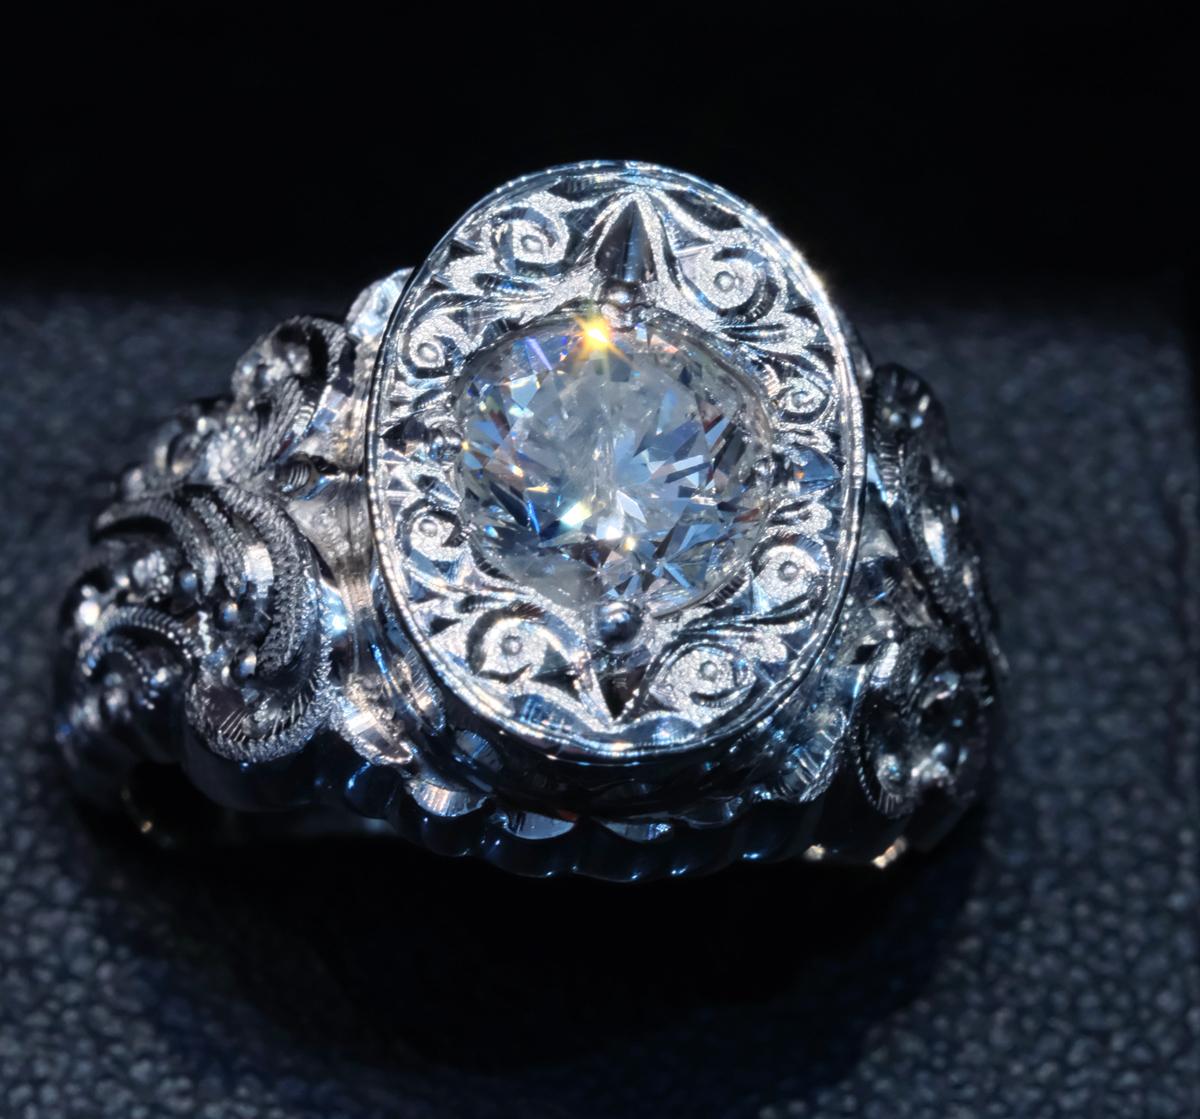 F2328【手創彫金】美しい天然大粒ダイヤモンド1.50ct 最高級Pt900無垢セレブリティメンズリング サイズ19 重量26.49g 縦幅16.6mm_画像2